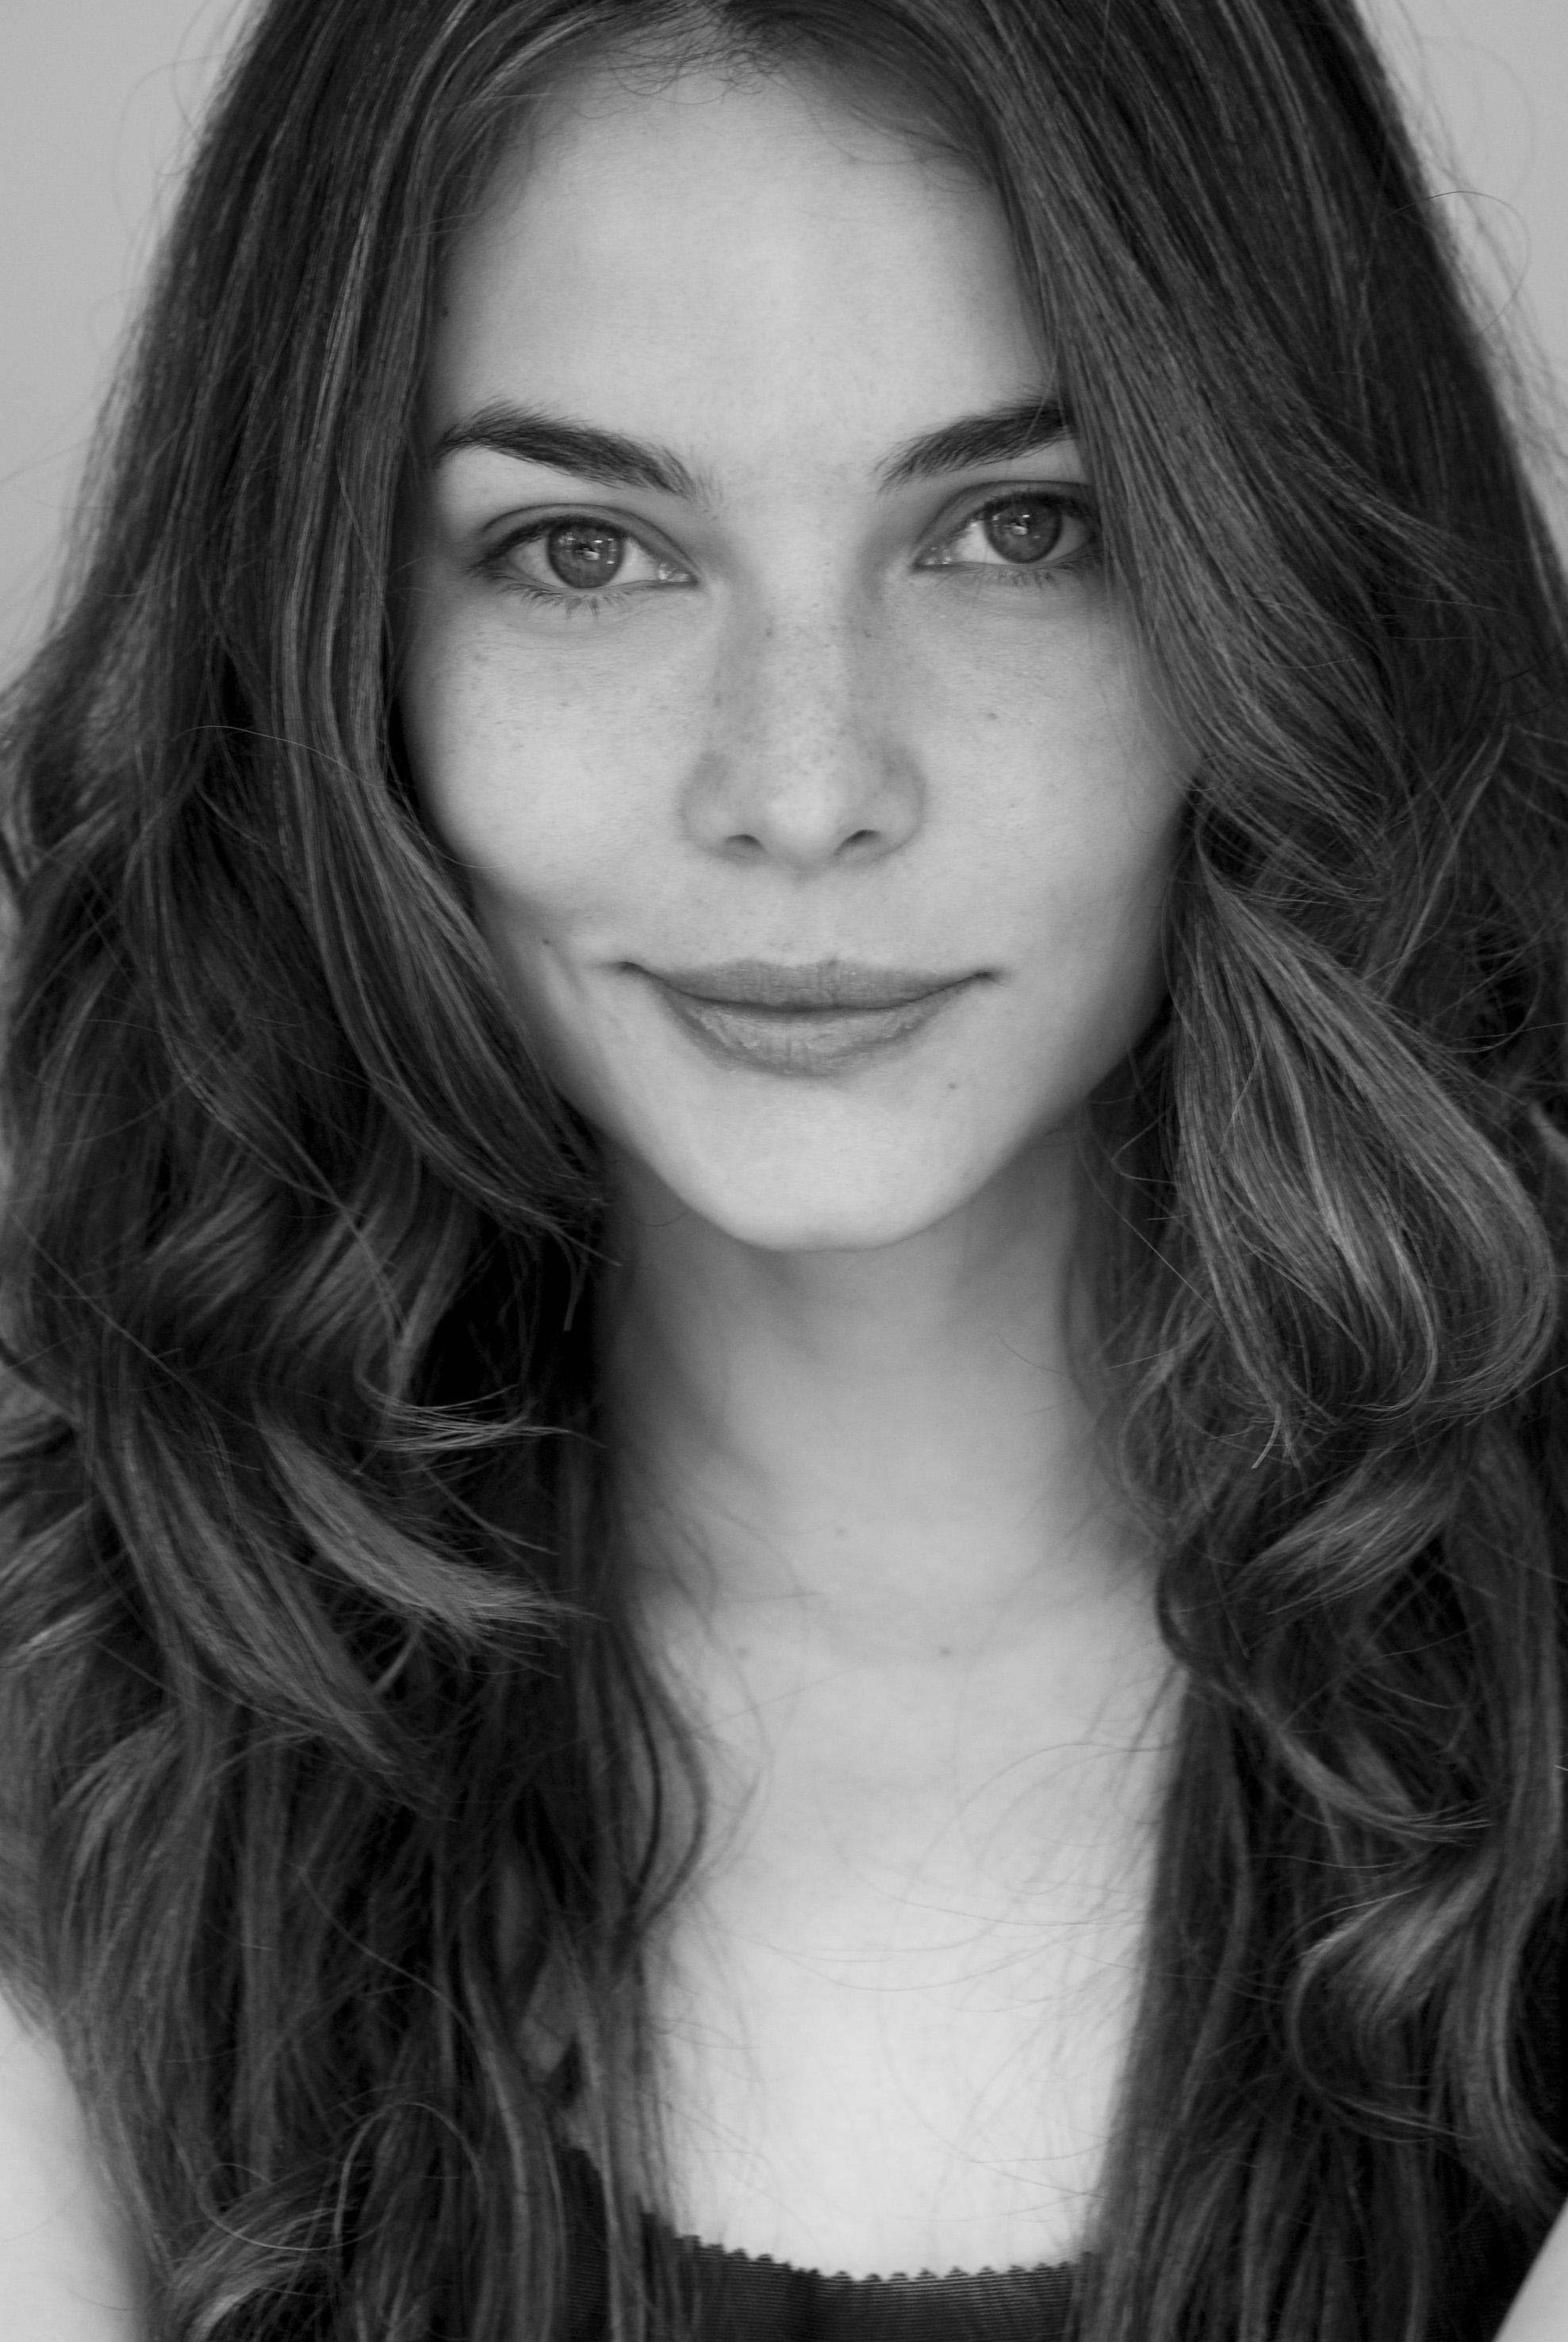 Portrait_of_Maria_Dalmazzo,_Headshot_in_